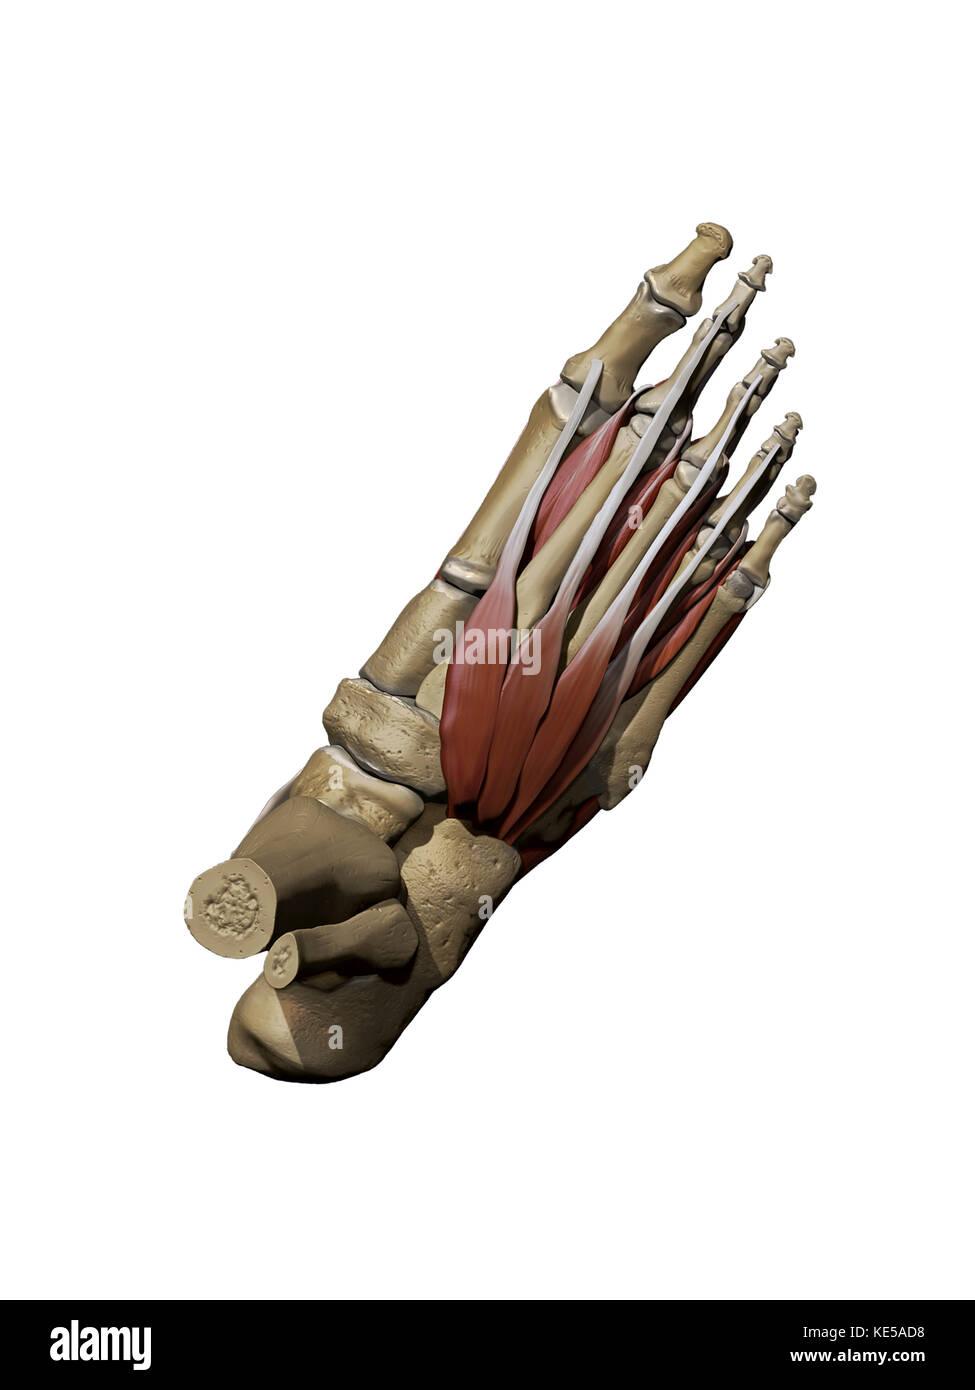 Großartig Muskeln Des Fußes Ideen - Anatomie Ideen - finotti.info